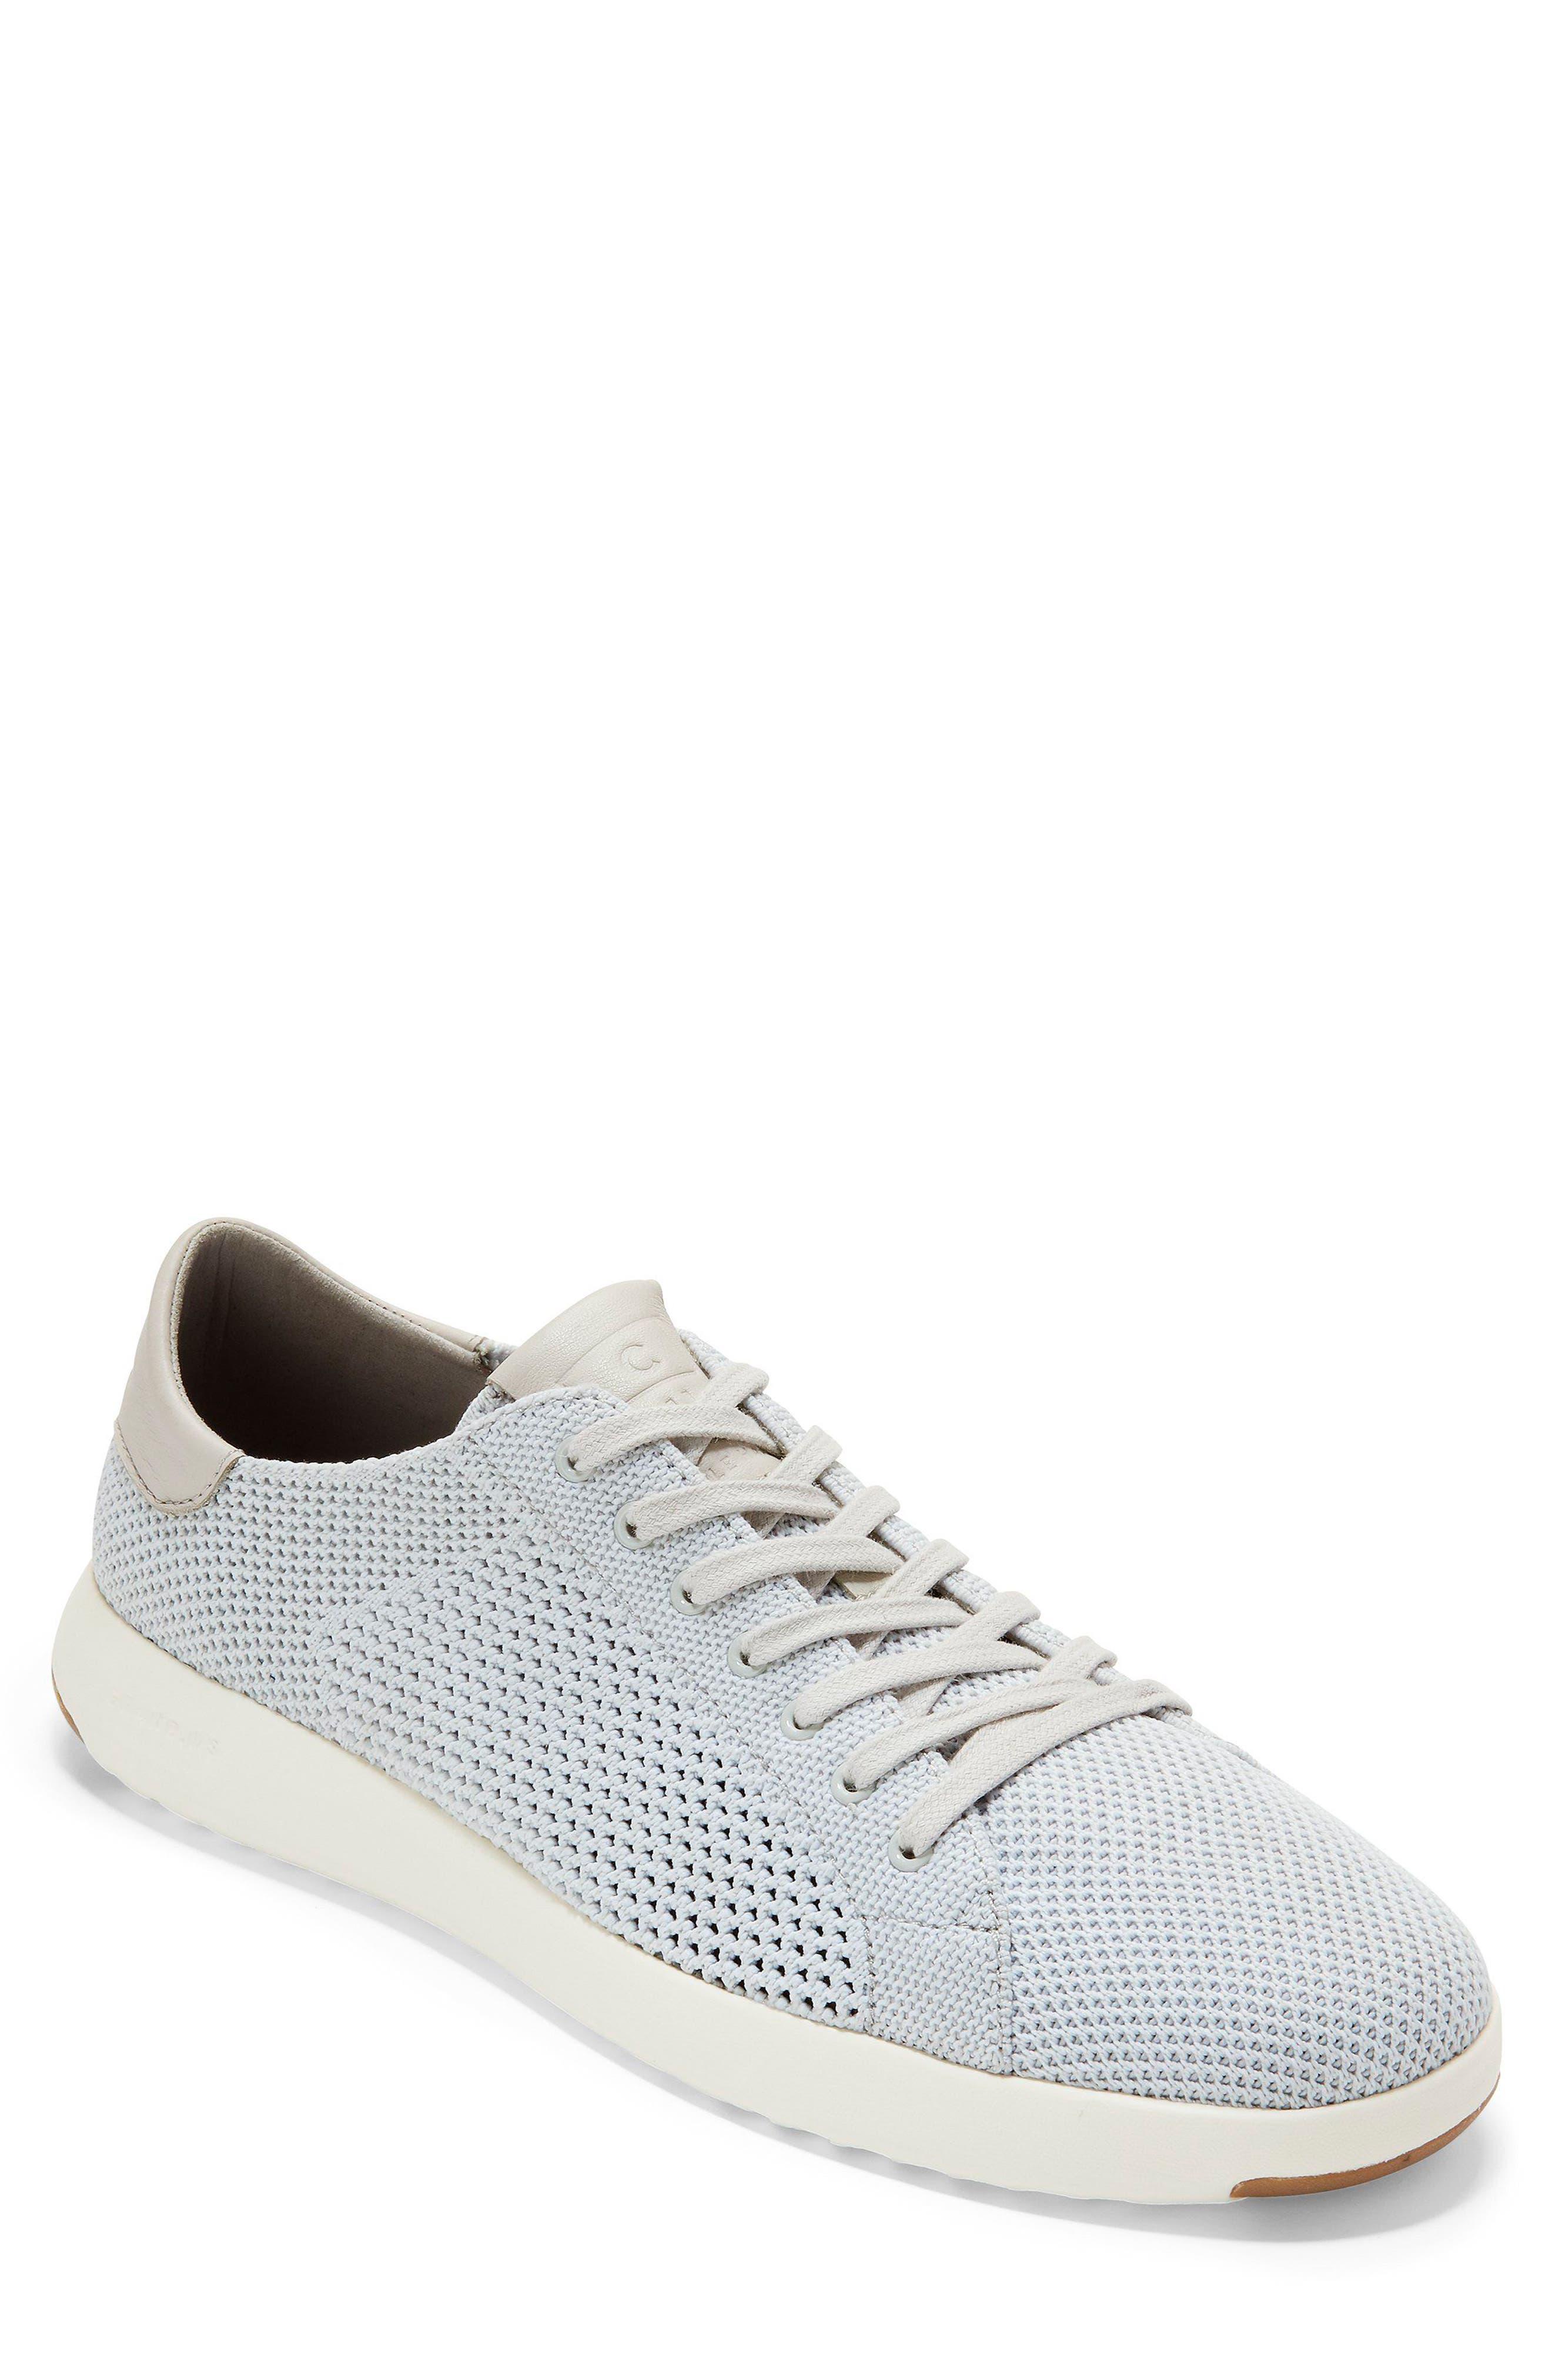 GrandPro Tennis Stitchlite Sneaker,                         Main,                         color, Vapor Gray/ Optic White